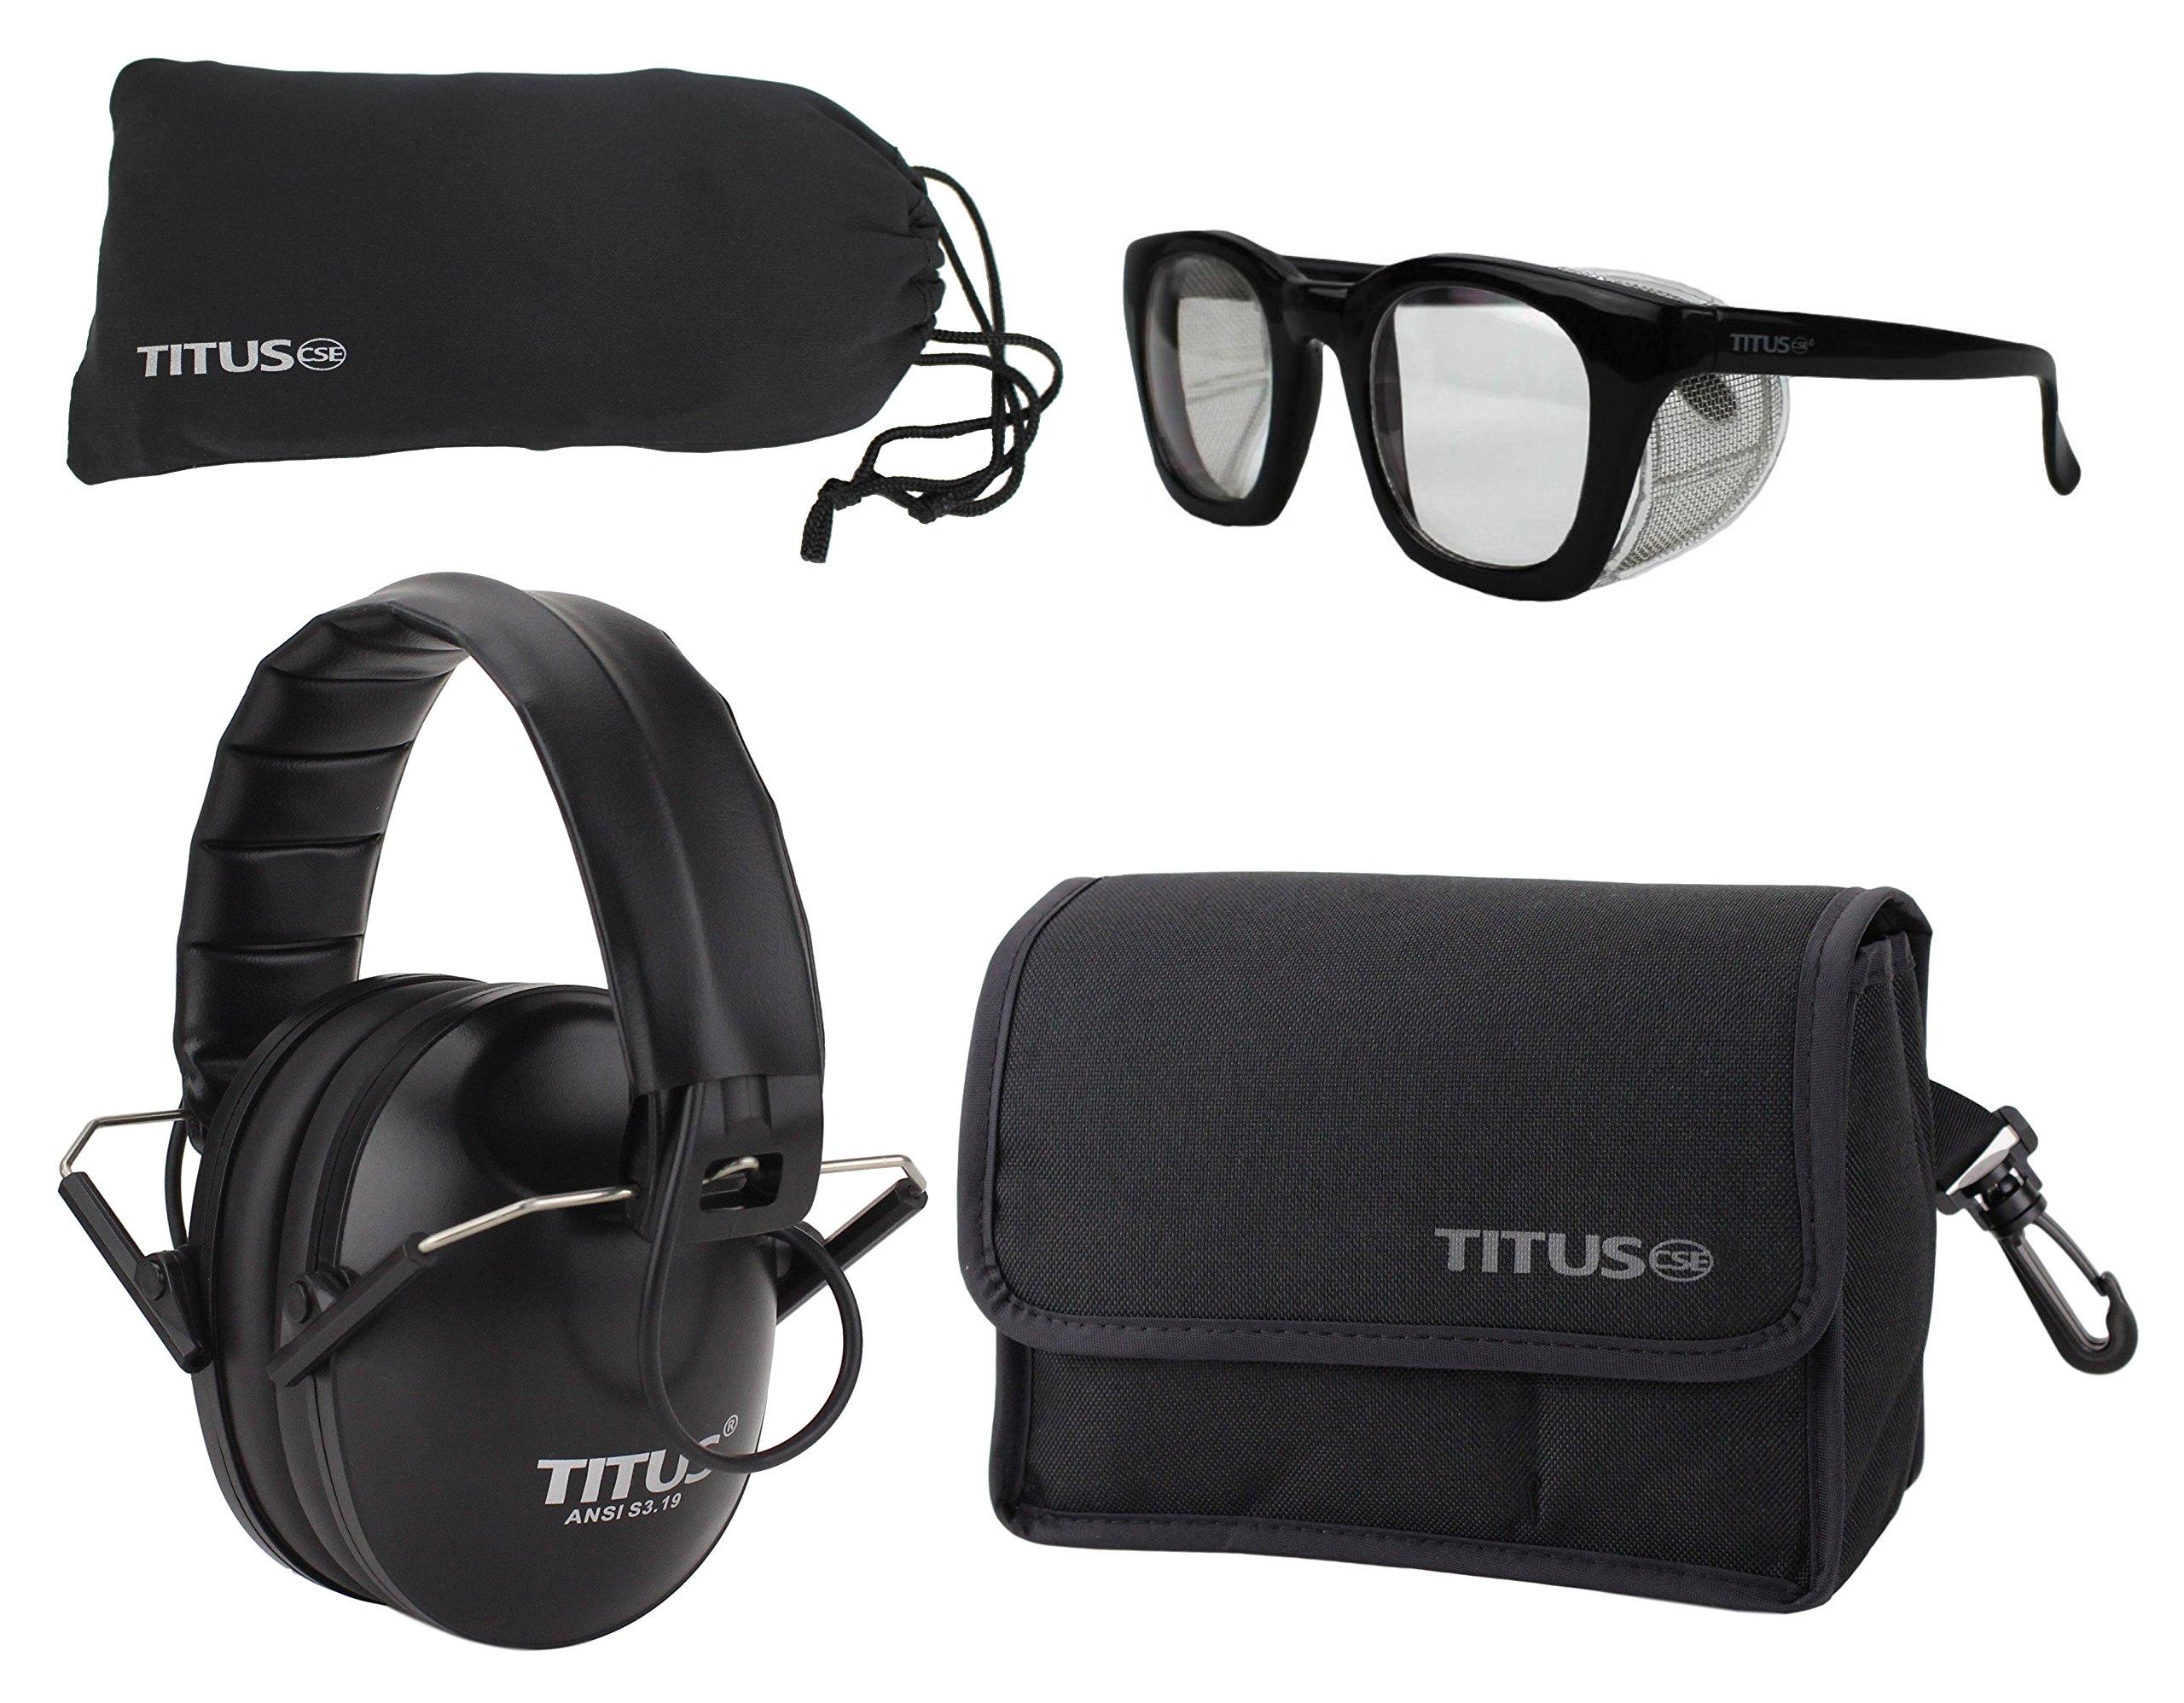 TITUS Top Combos: Safety Earmuffs & Glasses (Black Electronic - Slim, Z87.1 Clear Retro Folding Side Shield)